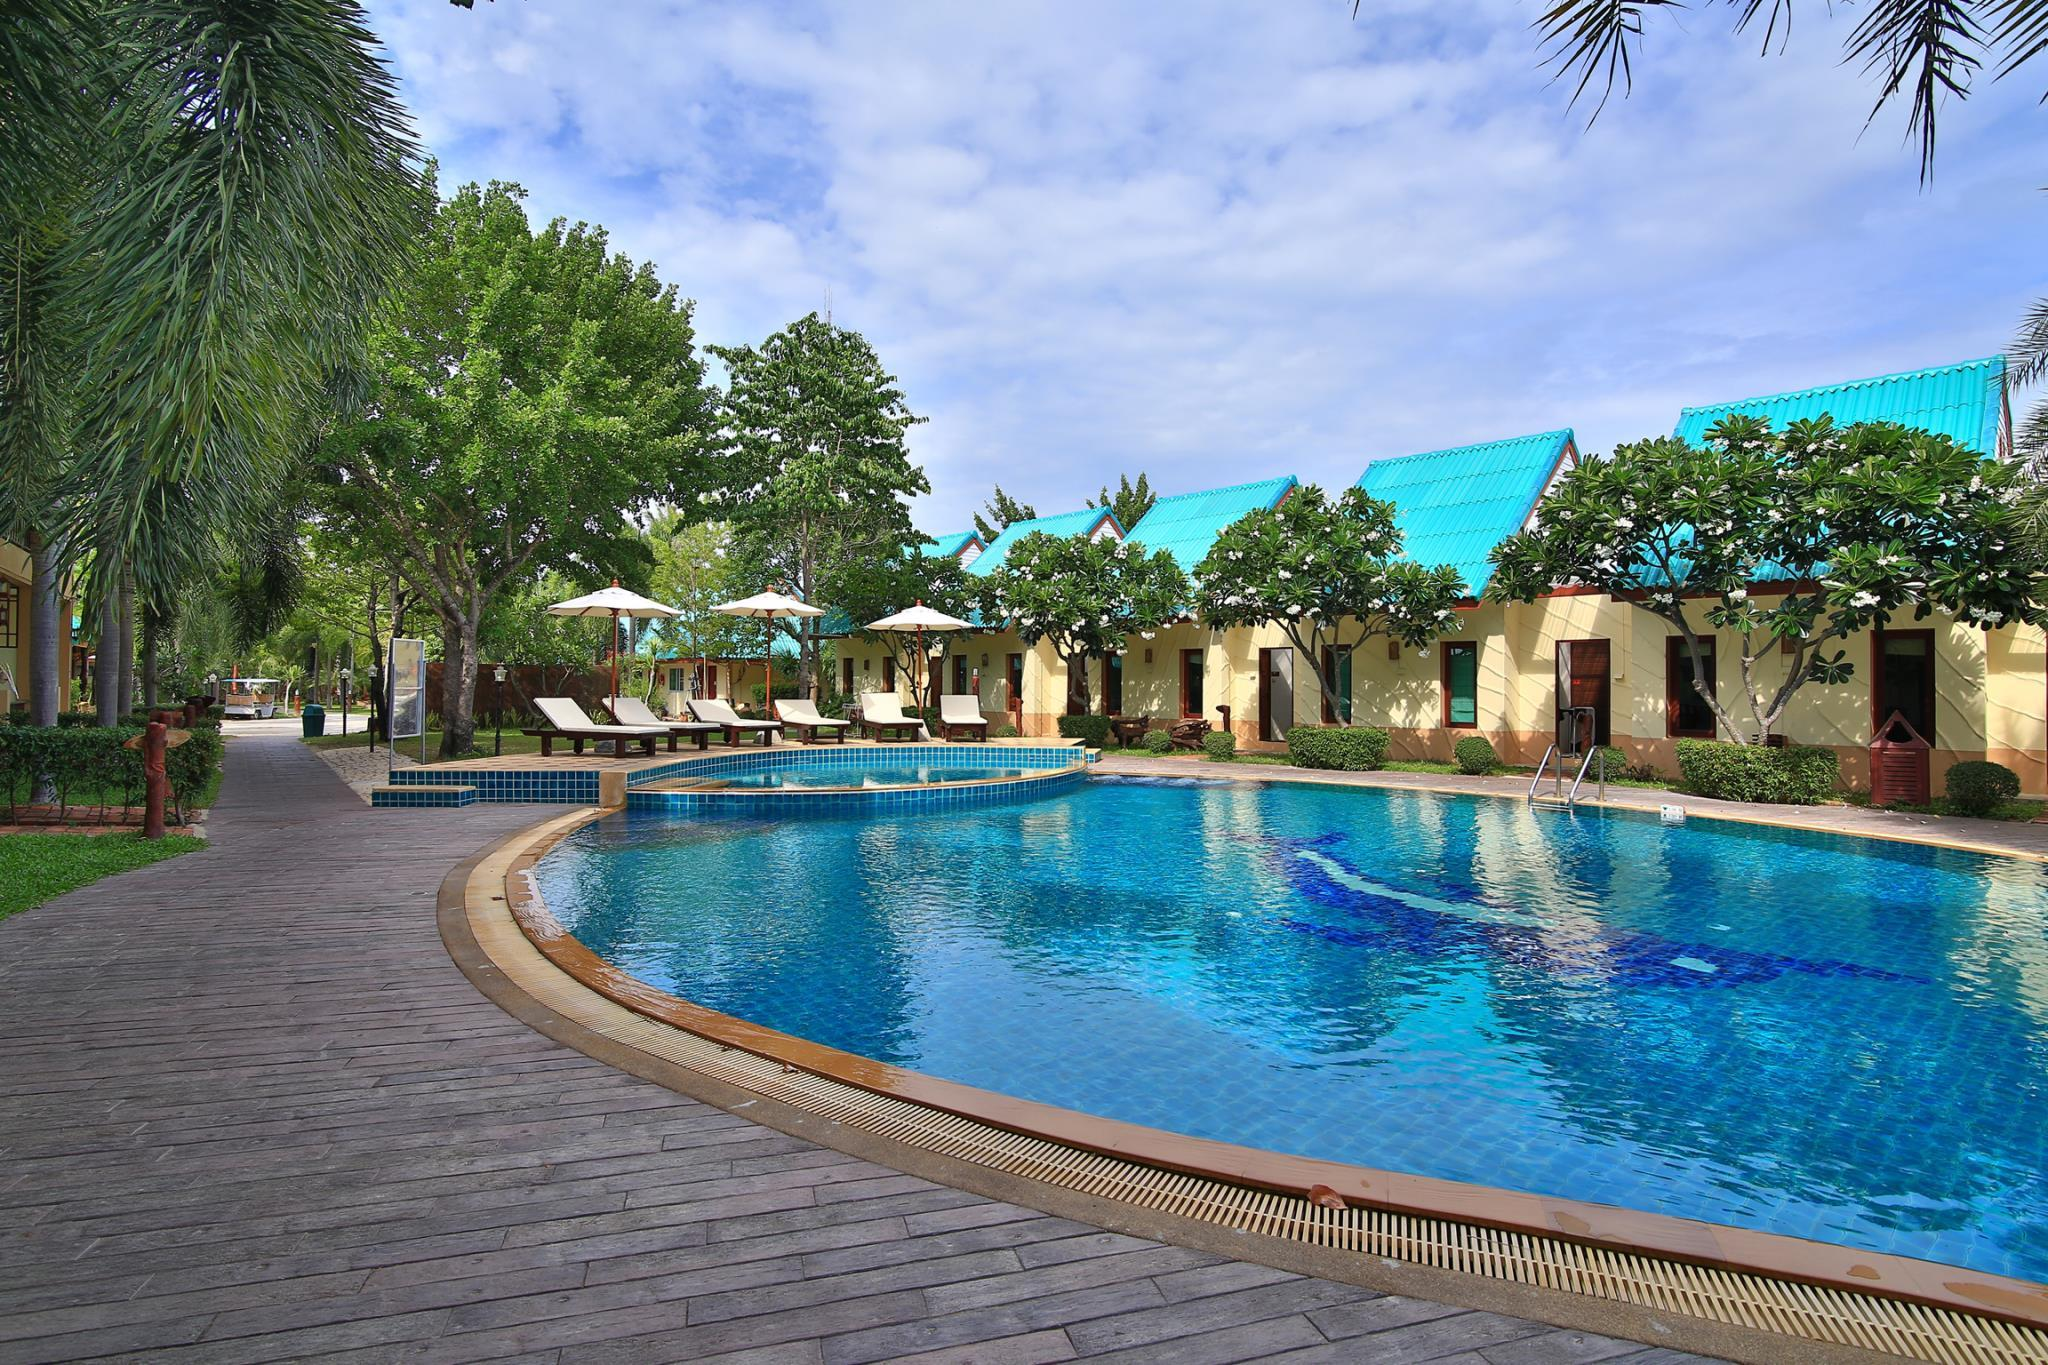 The Green Beach Resort